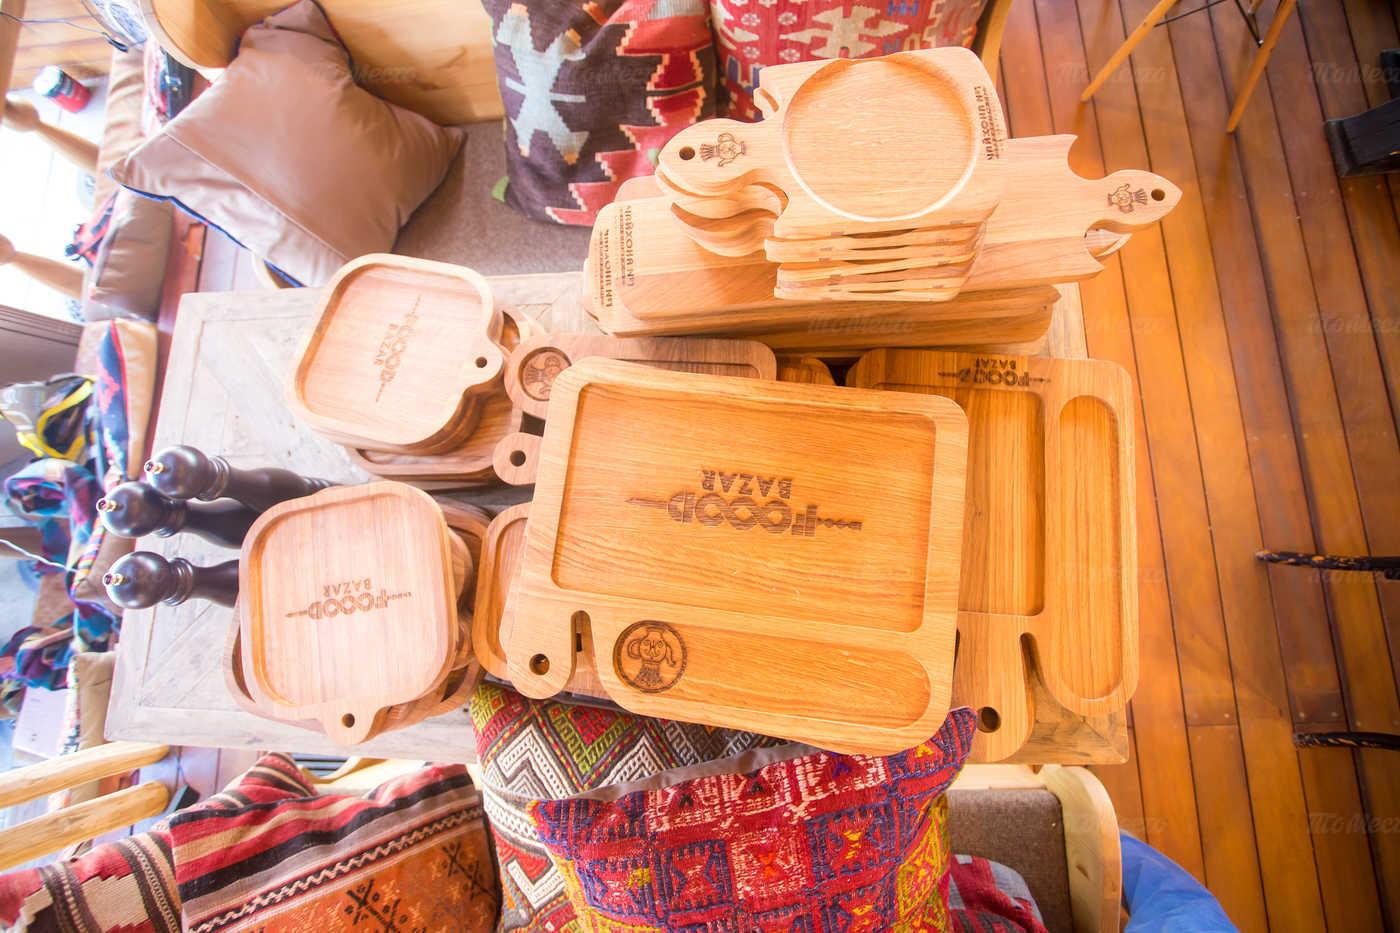 Банкеты ресторана FOOD BAZAR (Фуд базар) на улице Каретный Ряд фото 9